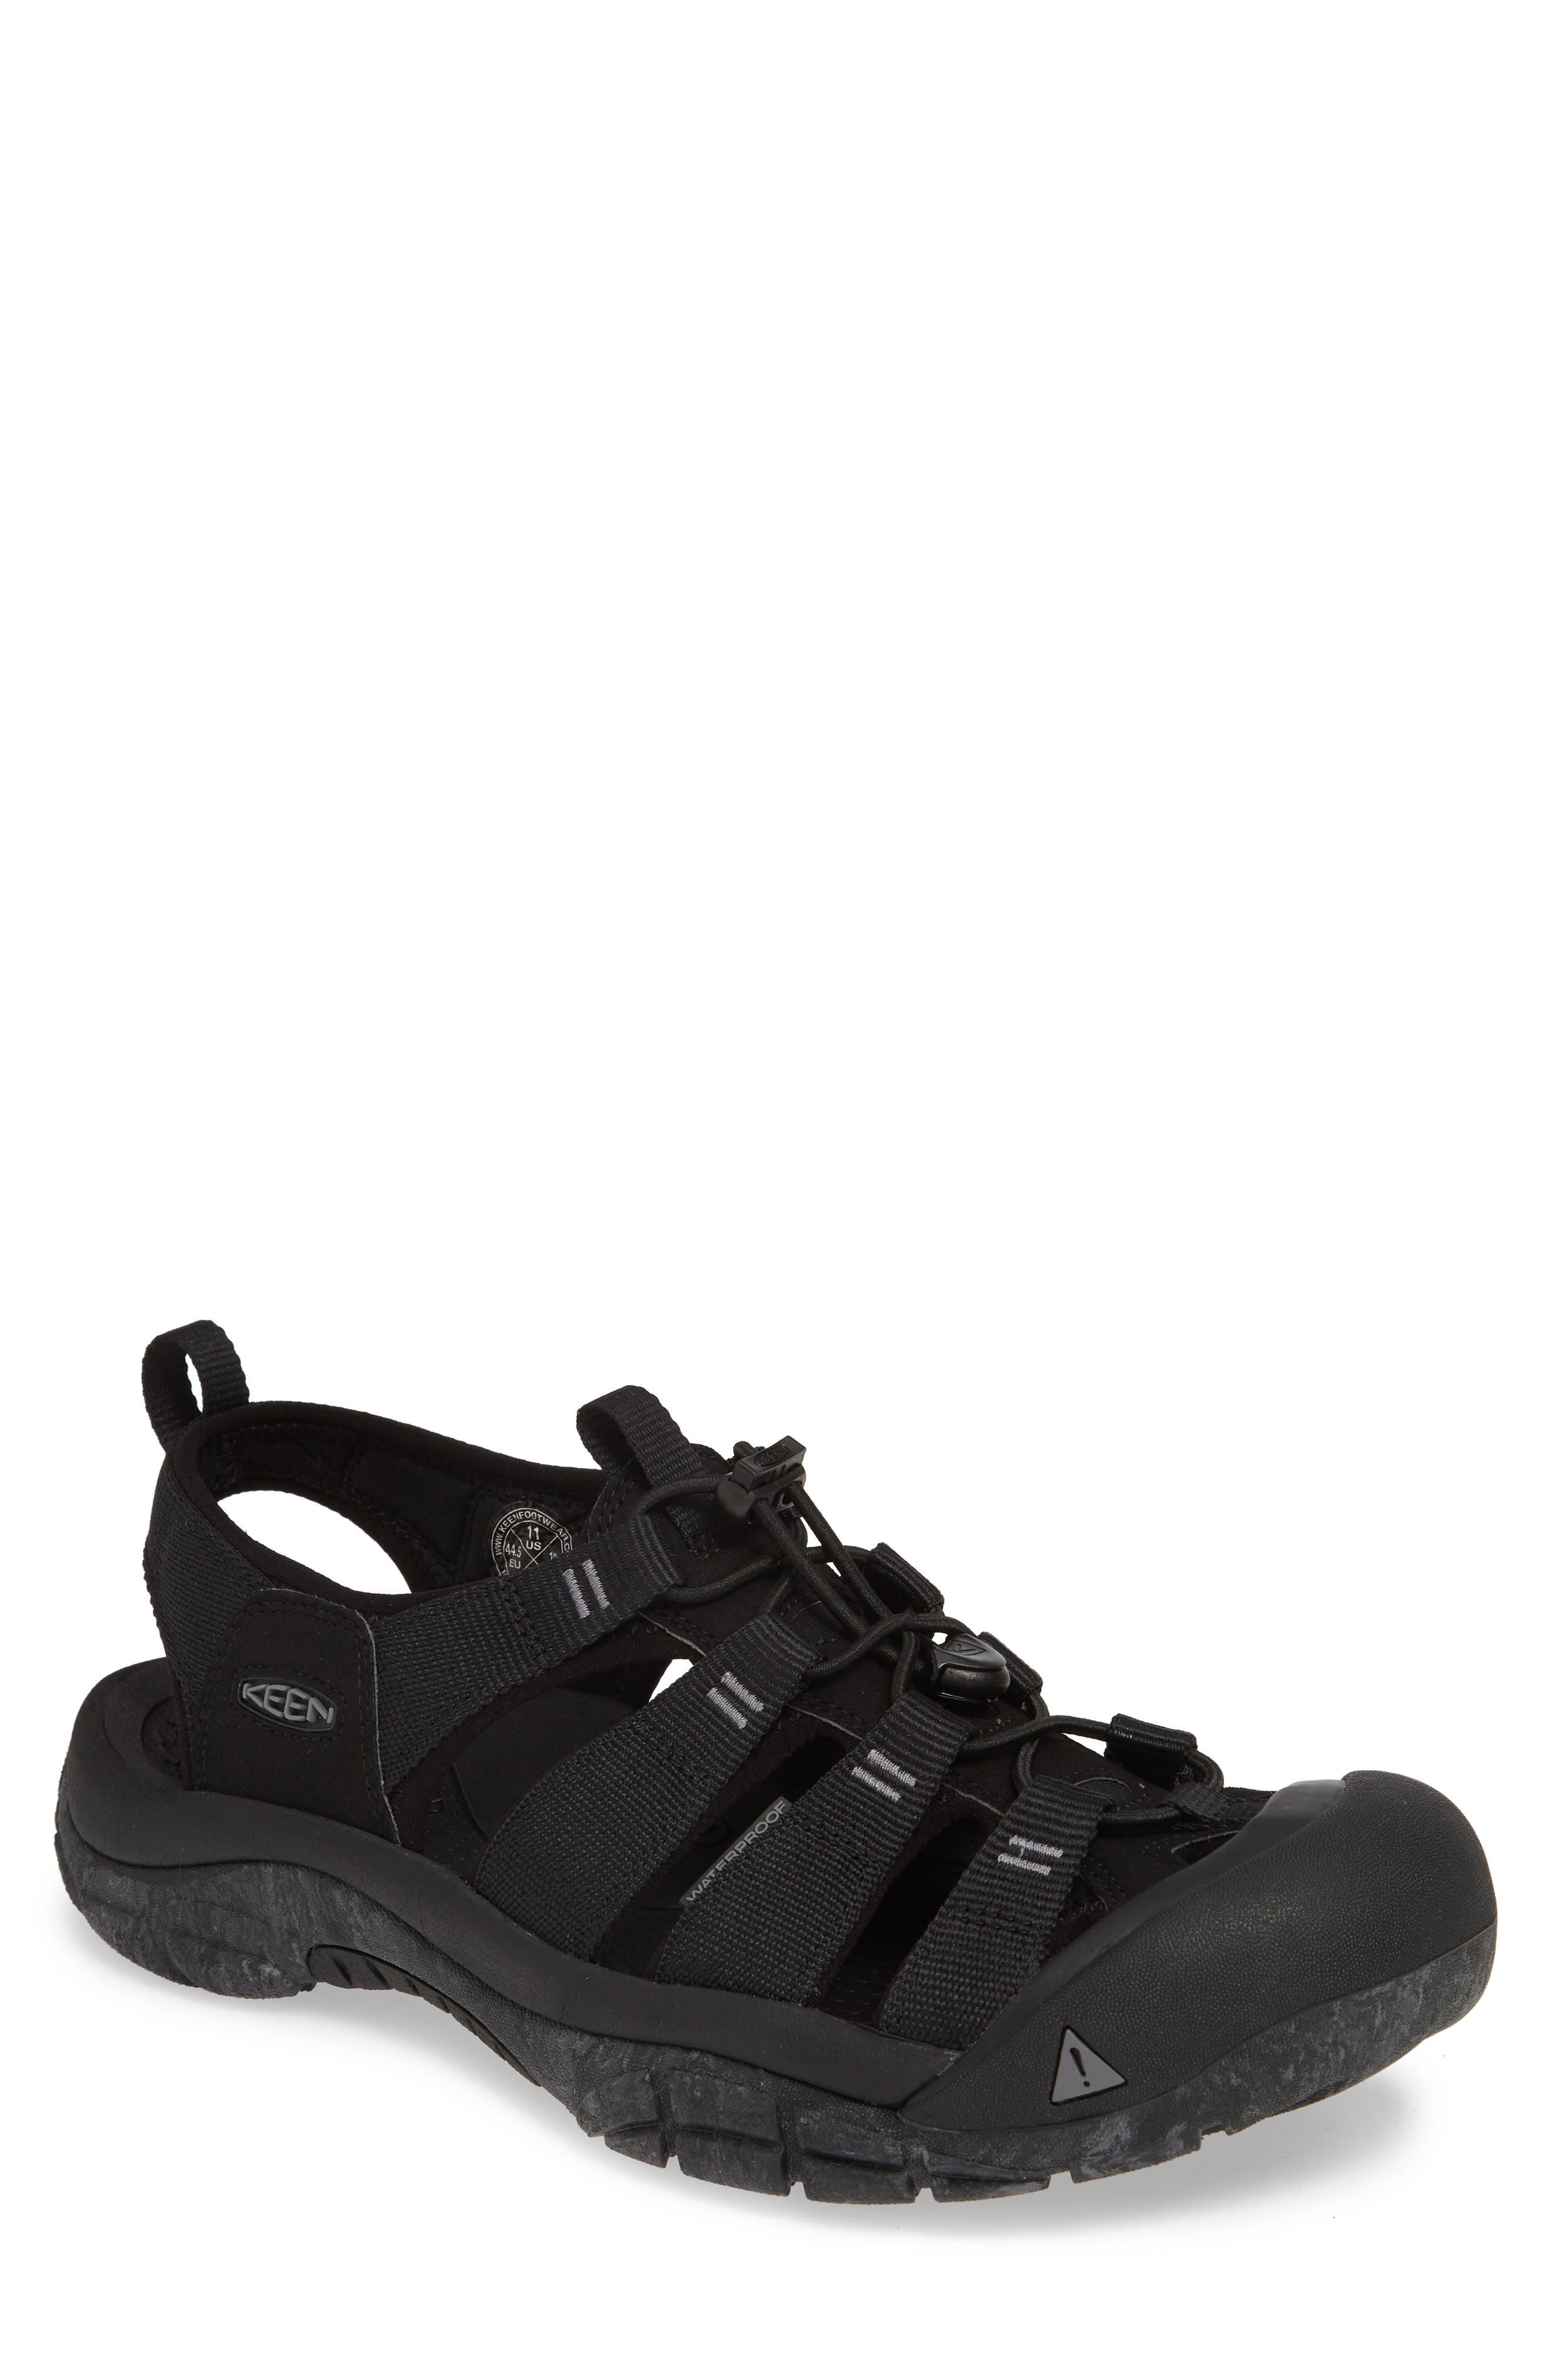 KEEN, 'Newport H2' Sandal, Main thumbnail 1, color, BLACK/ SWIRL OUTSOLE